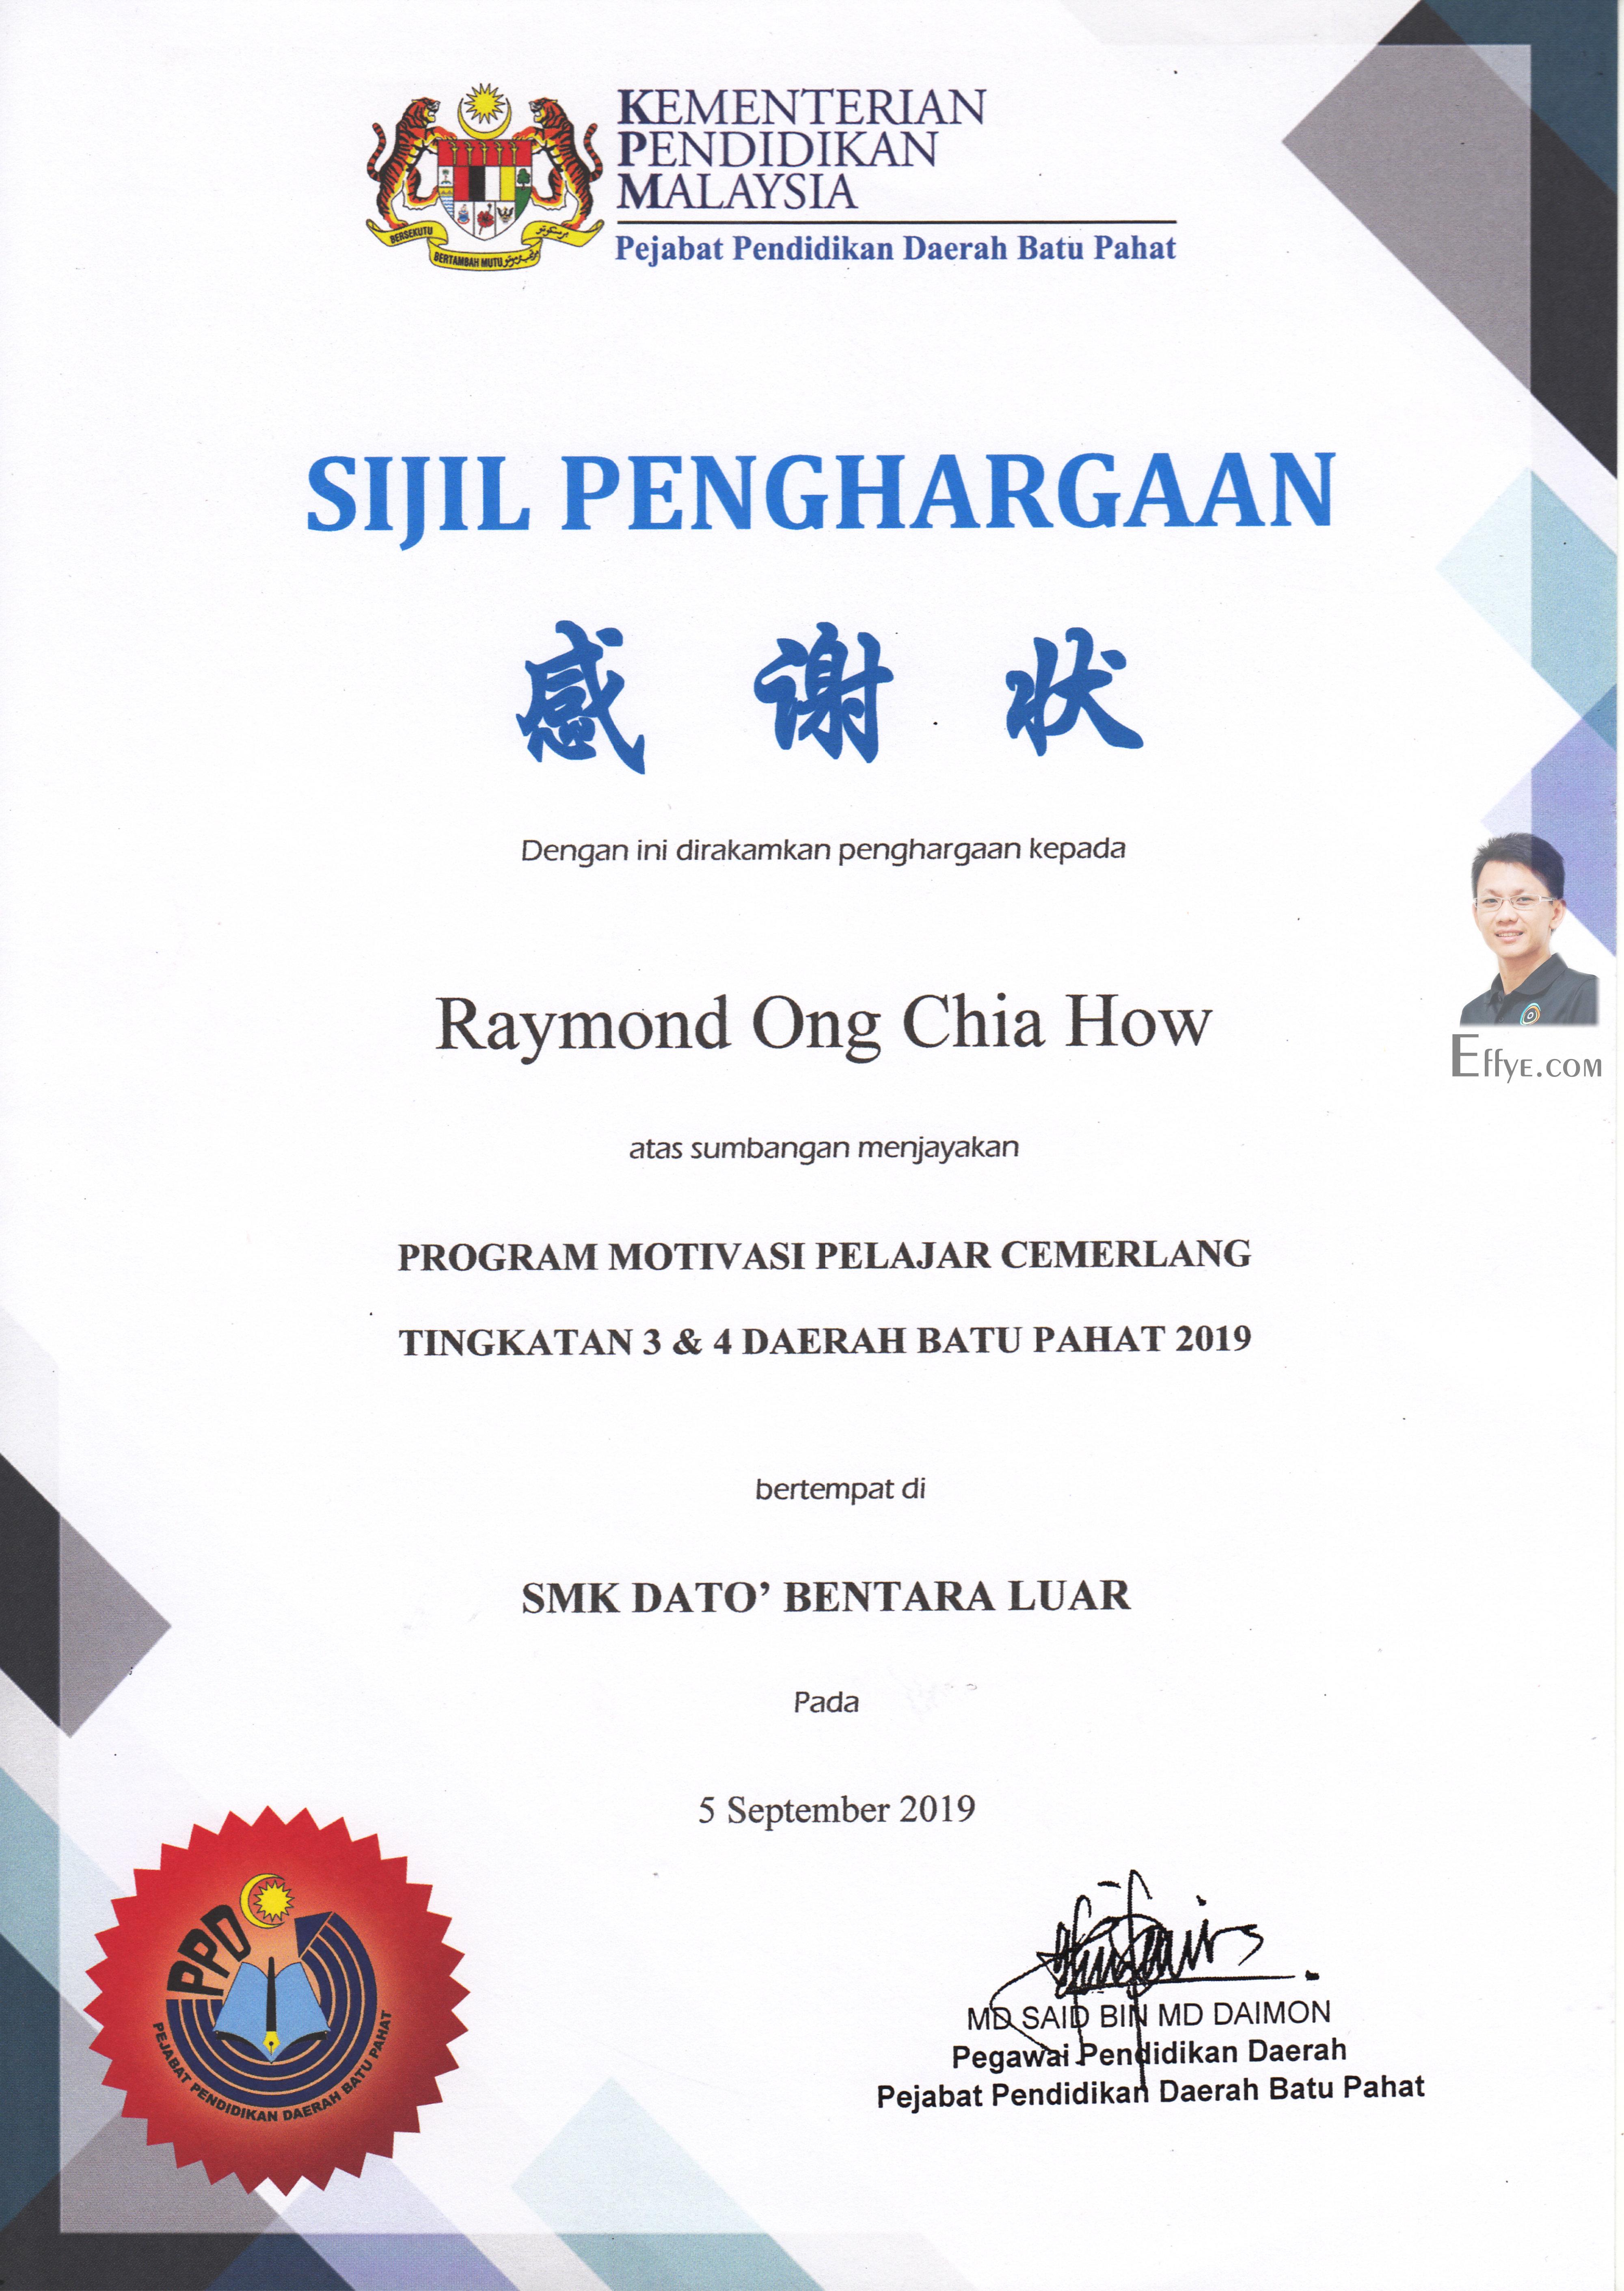 Sijil Penghargaan Raymond Ong Chia How Program Motivasi Pelajar Cemerlang Tingkatan 3 dan 4 Daerah Batu pahat 2019 bertempat di SMK Dato Bentara Luar SDBL at 05 September 2019 Effye Media Raymond